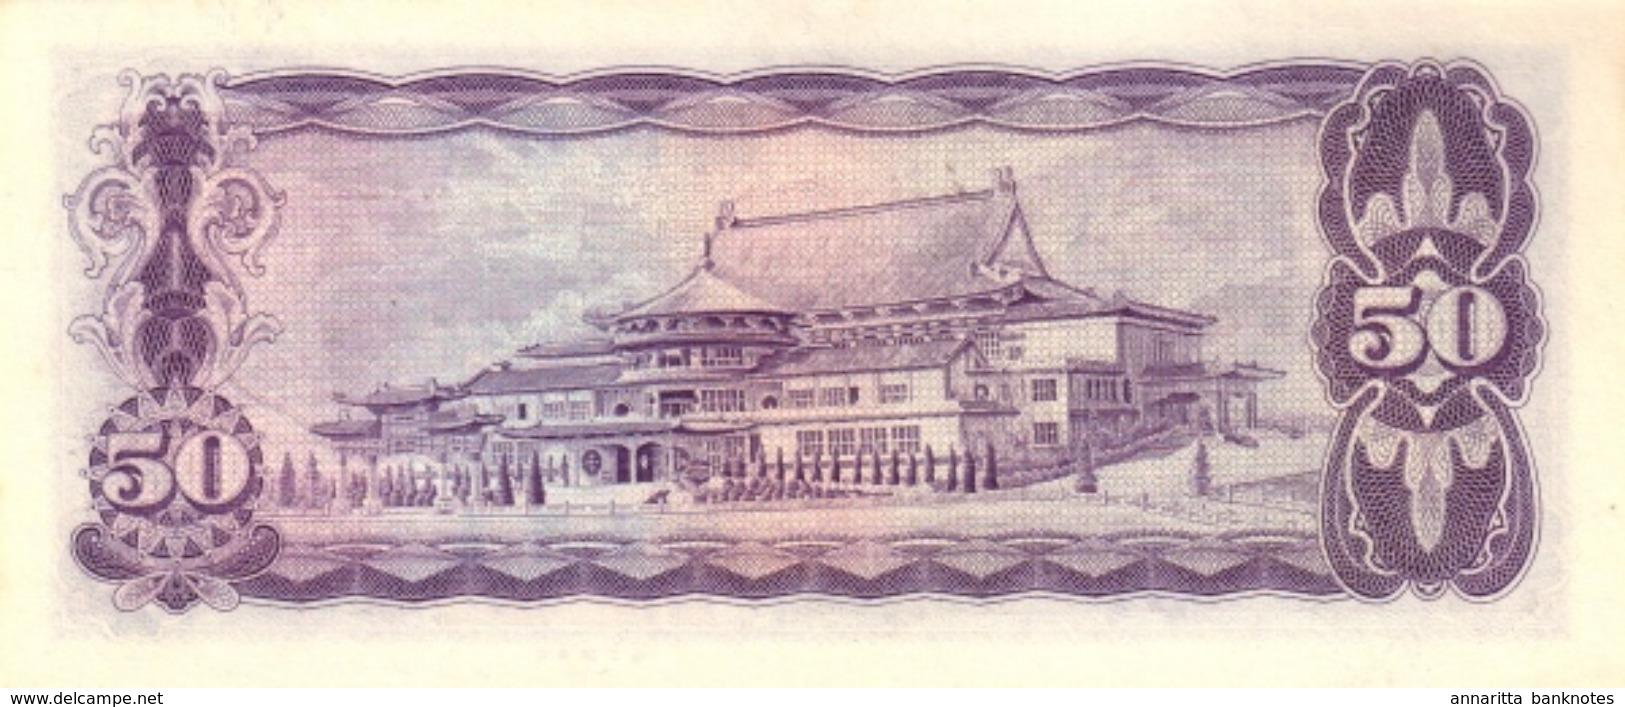 TAIWAN 50 YUAN 1970 P-1980 AU/UNC [TW382a] - Taiwan